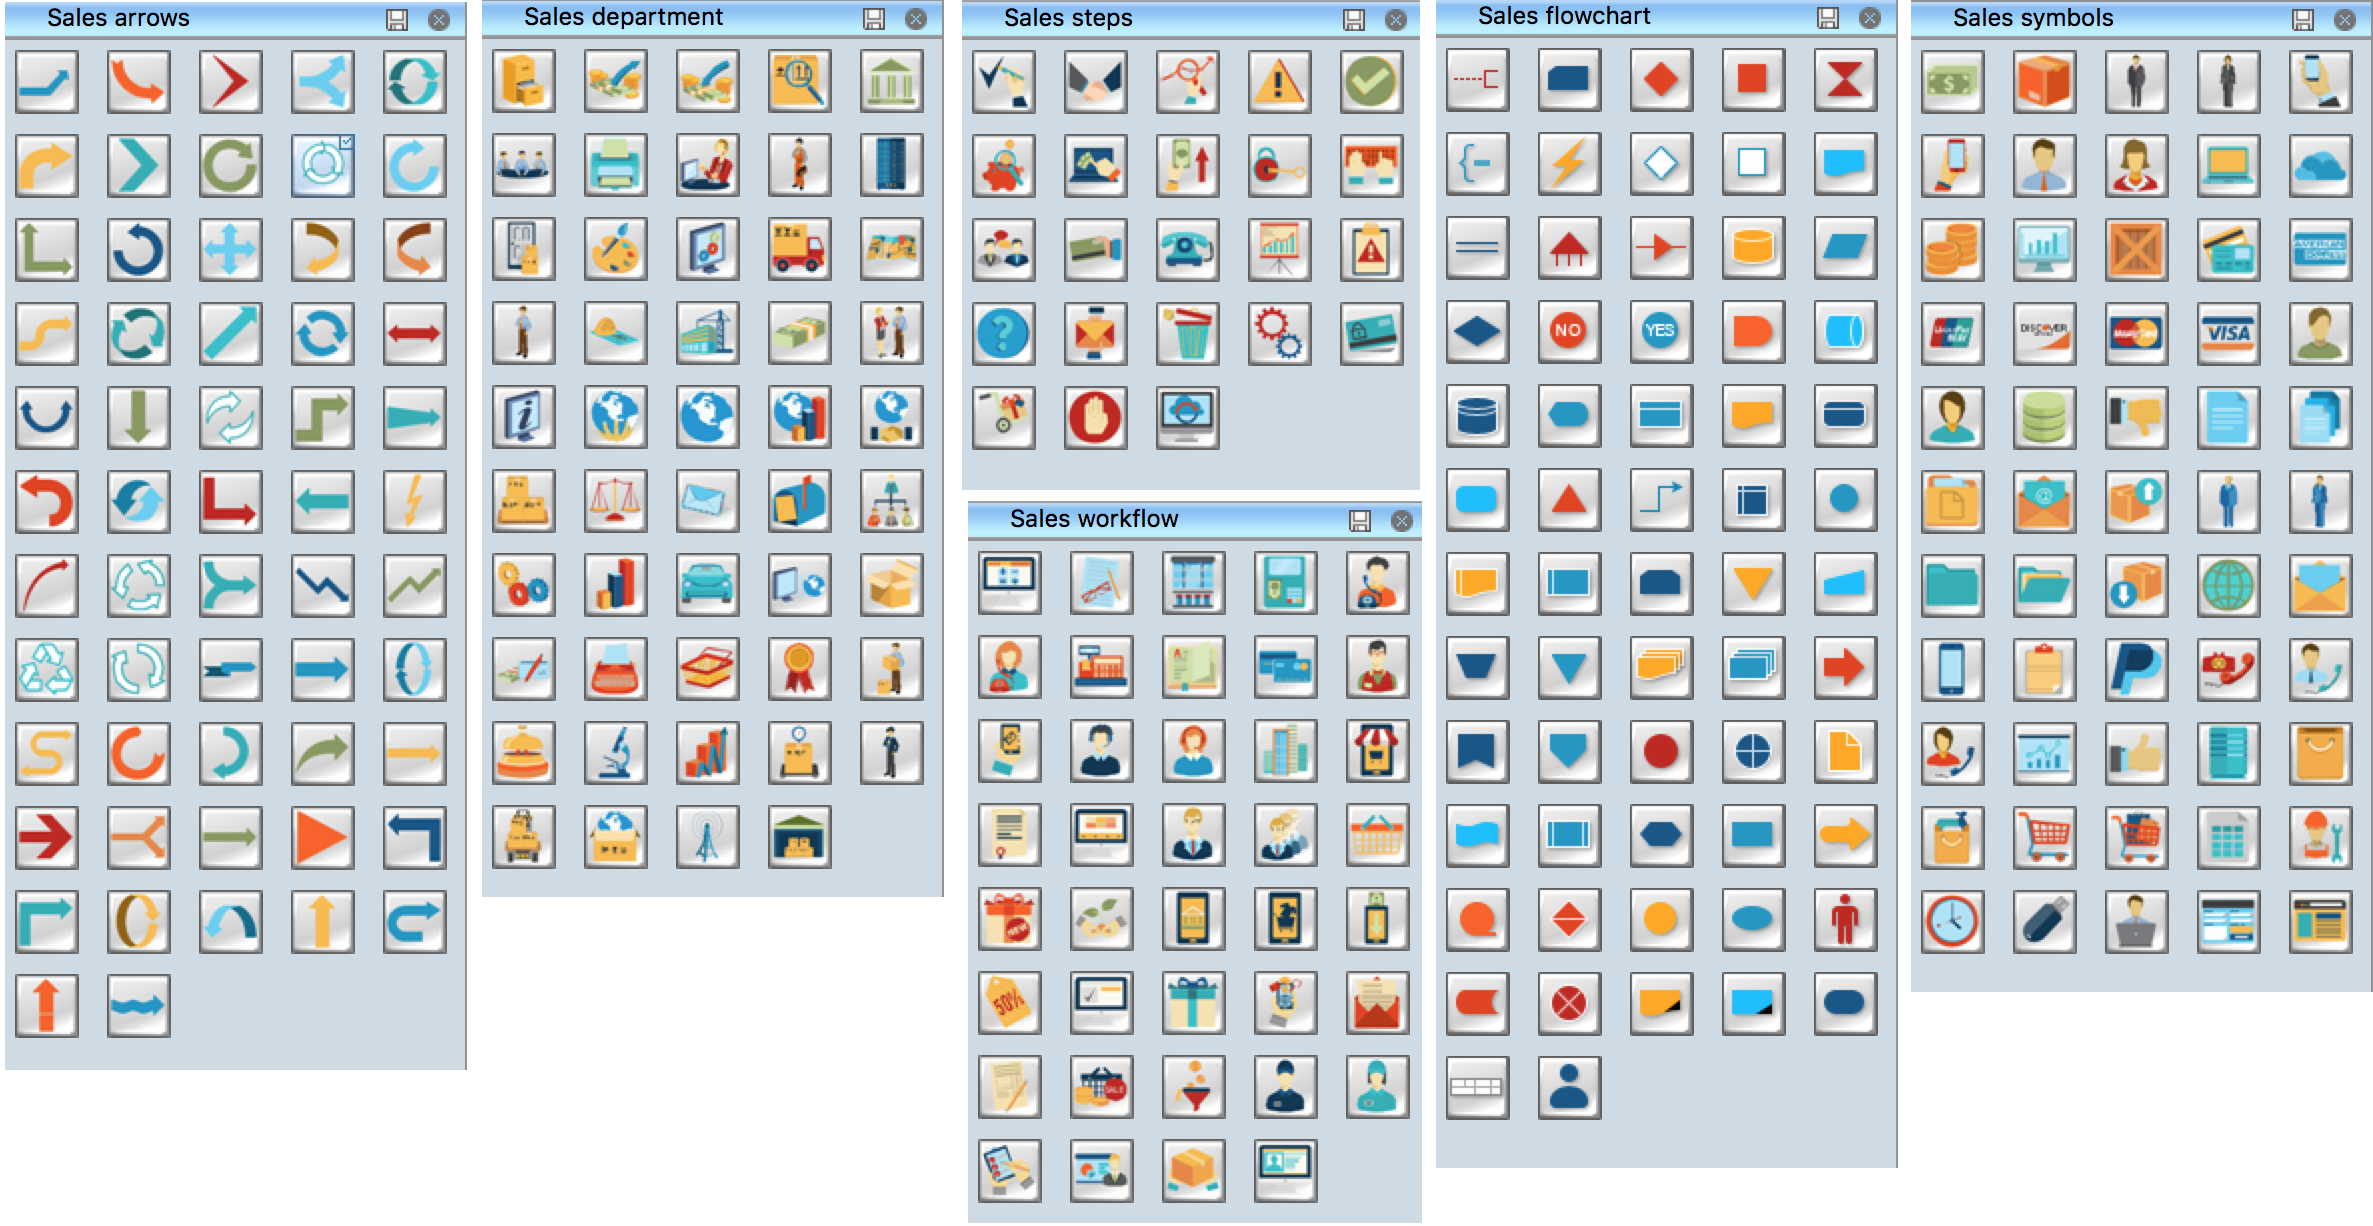 hight resolution of sales process flowchart symbols sales process flow diagram red green blue colored flowchart symbols